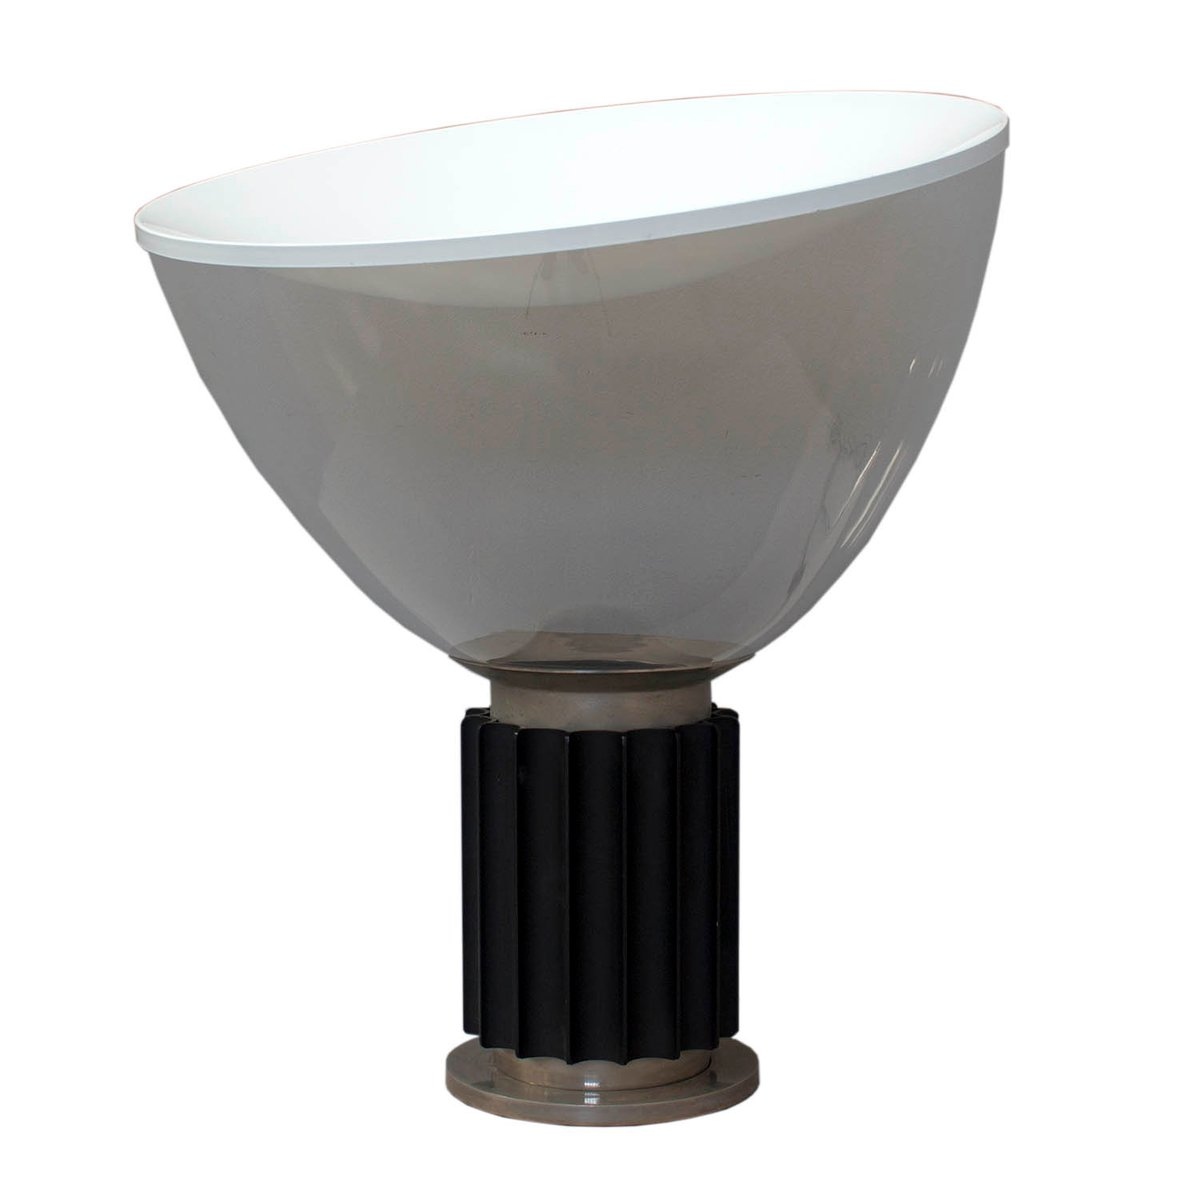 Vintage Taccia Lampe von Castiglioni Brothers für Flos